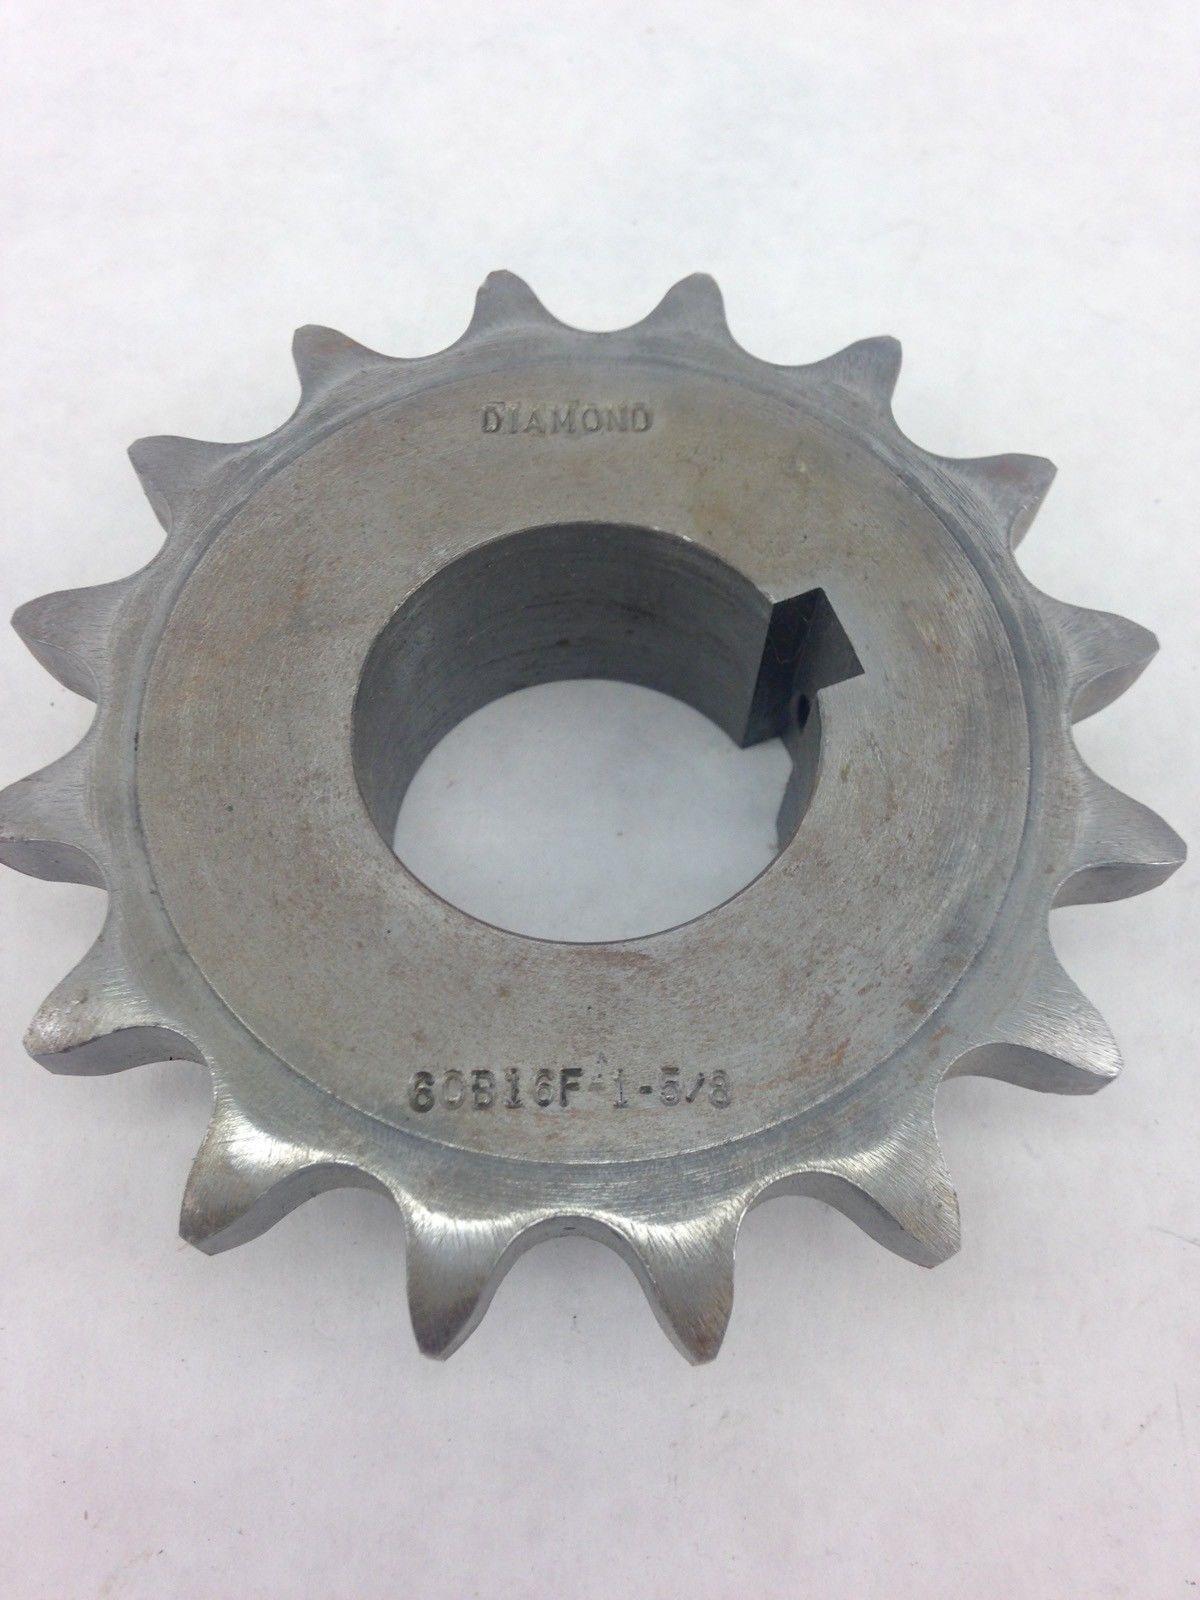 DIAMOND 60B16F 1-5/8 SPROCKET (A830) 1